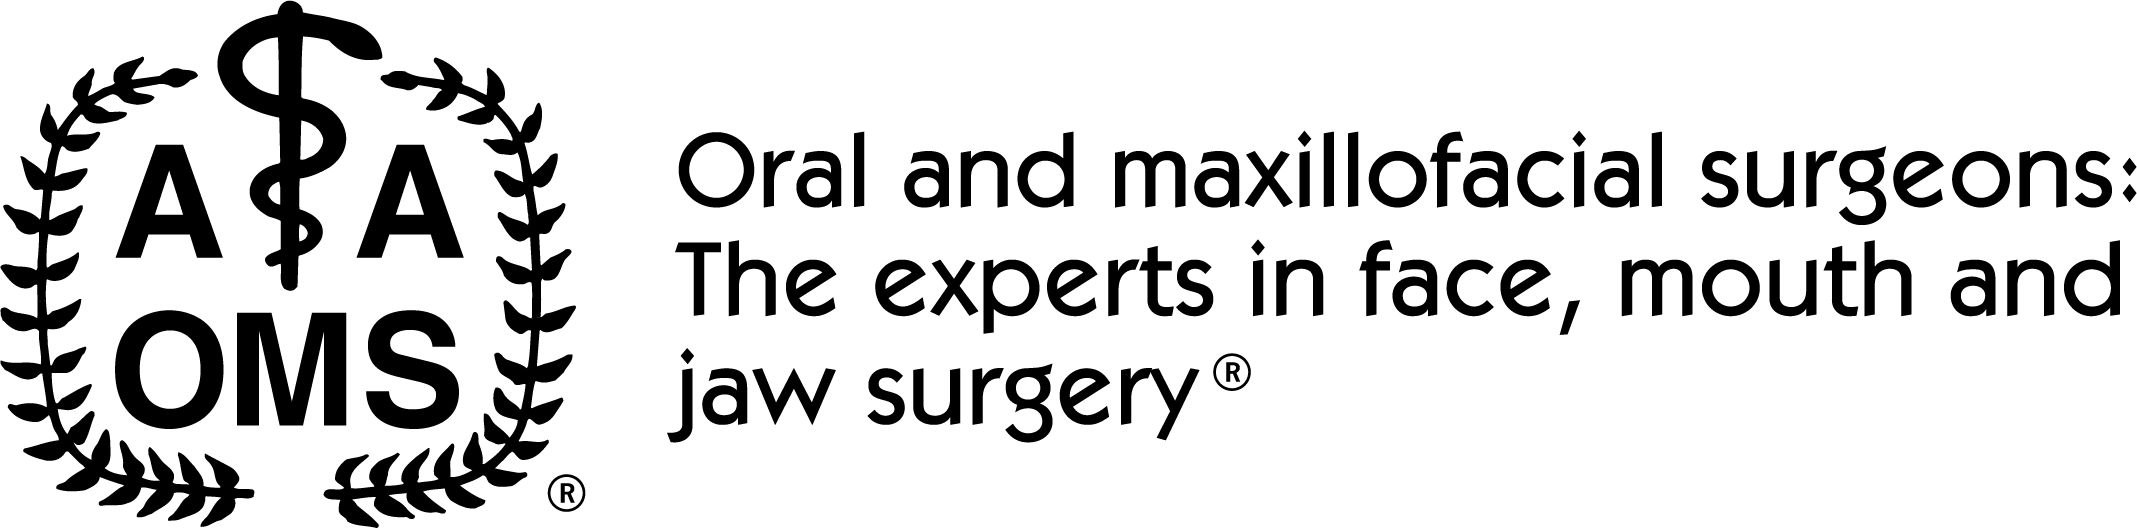 American Association of Oral & Maxillofacial Surgeons Logo and Tagline